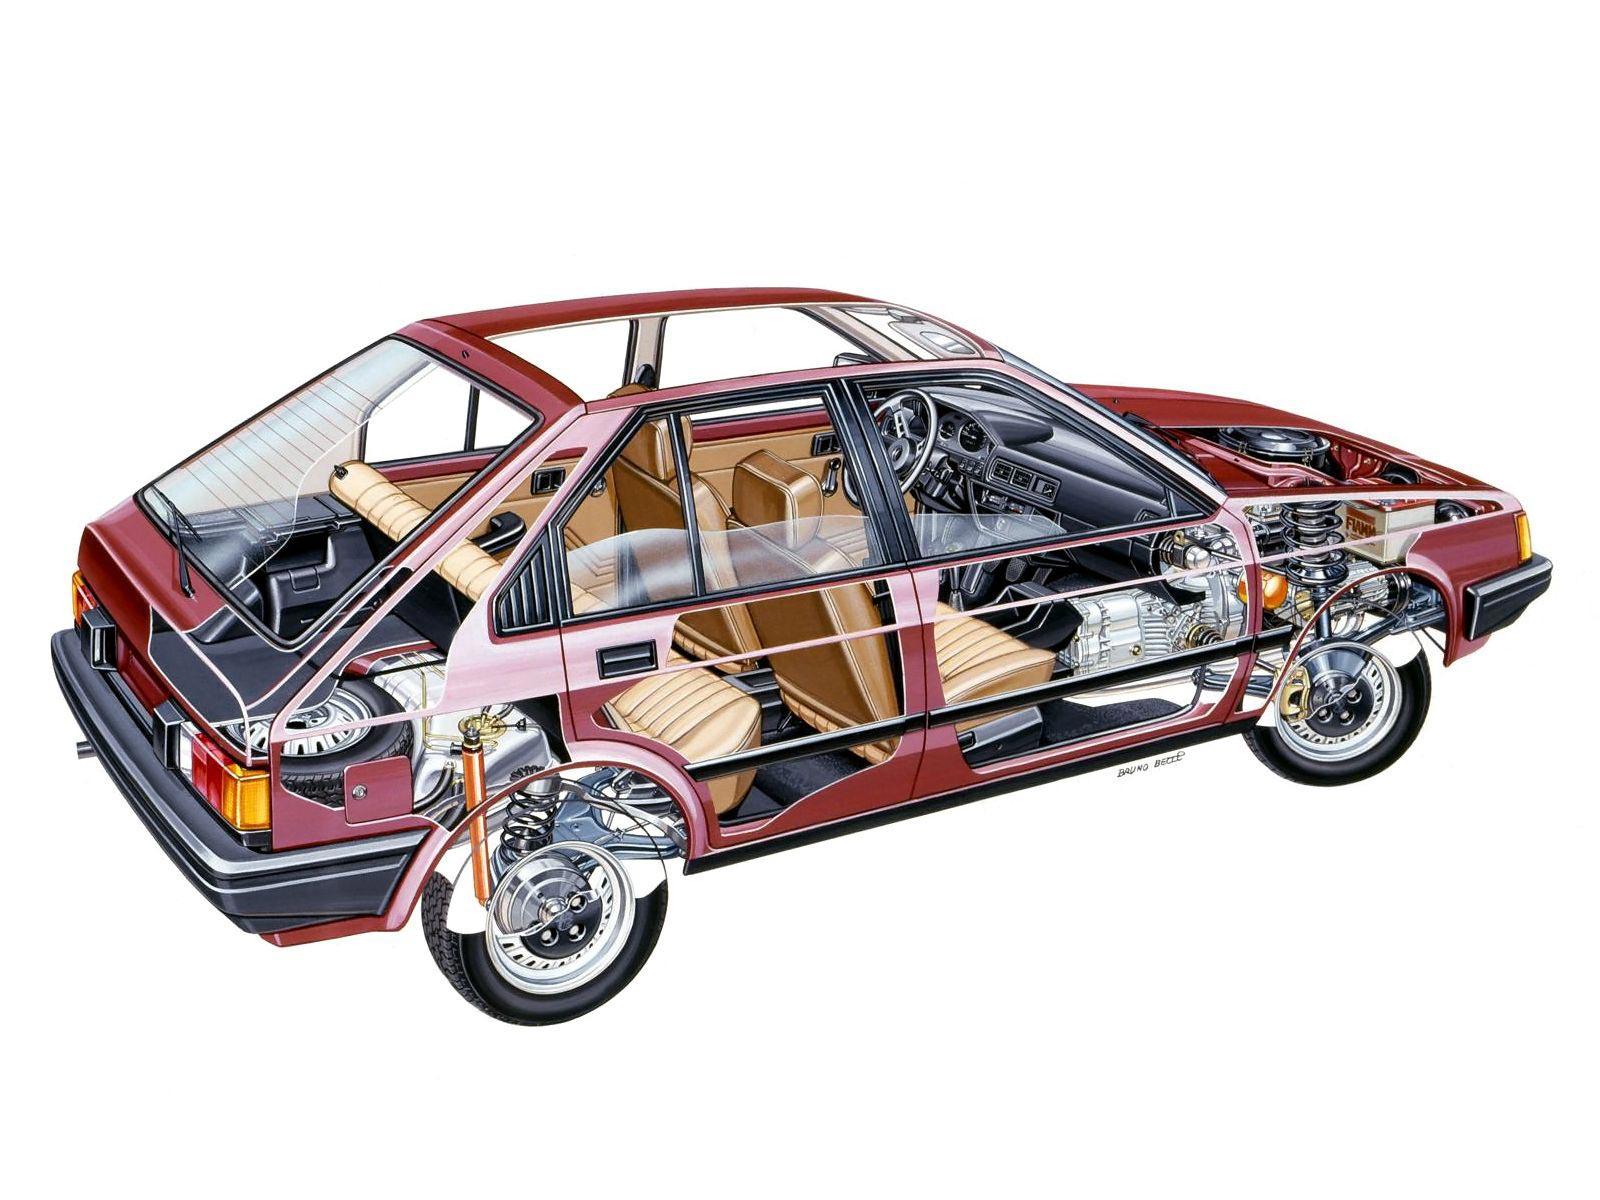 Alfa Romeo Arna cutaway